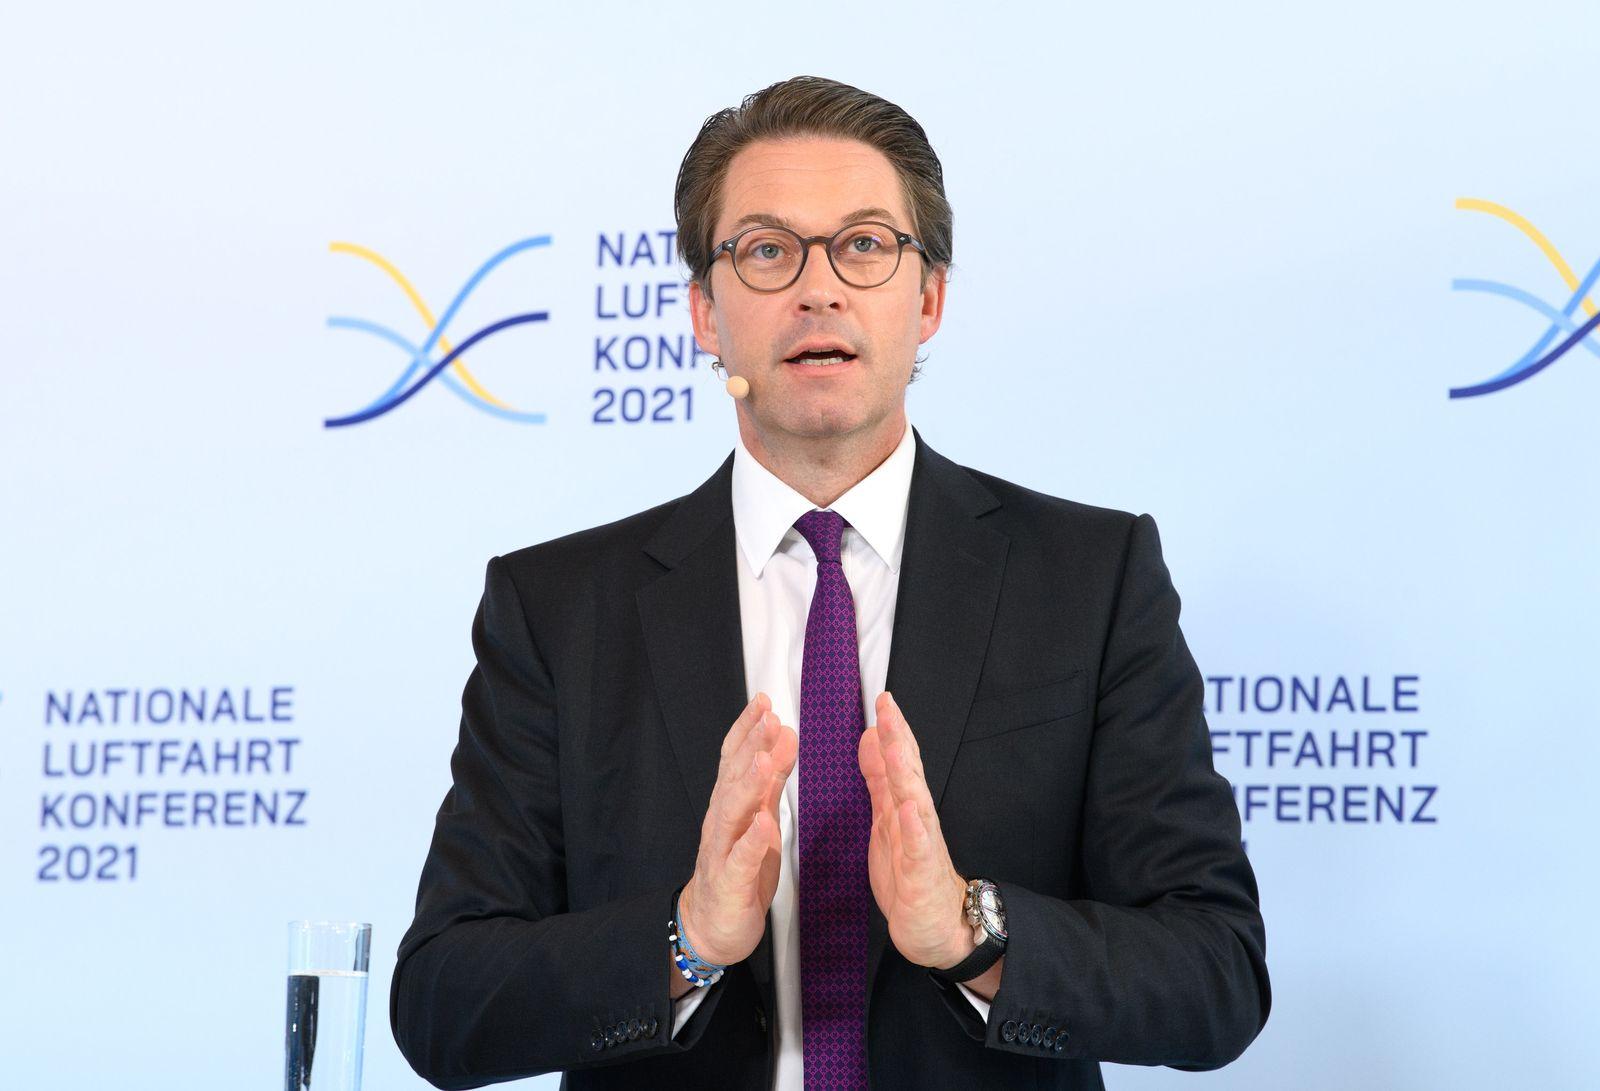 Nationale Luftfahrtkonferenz 2021